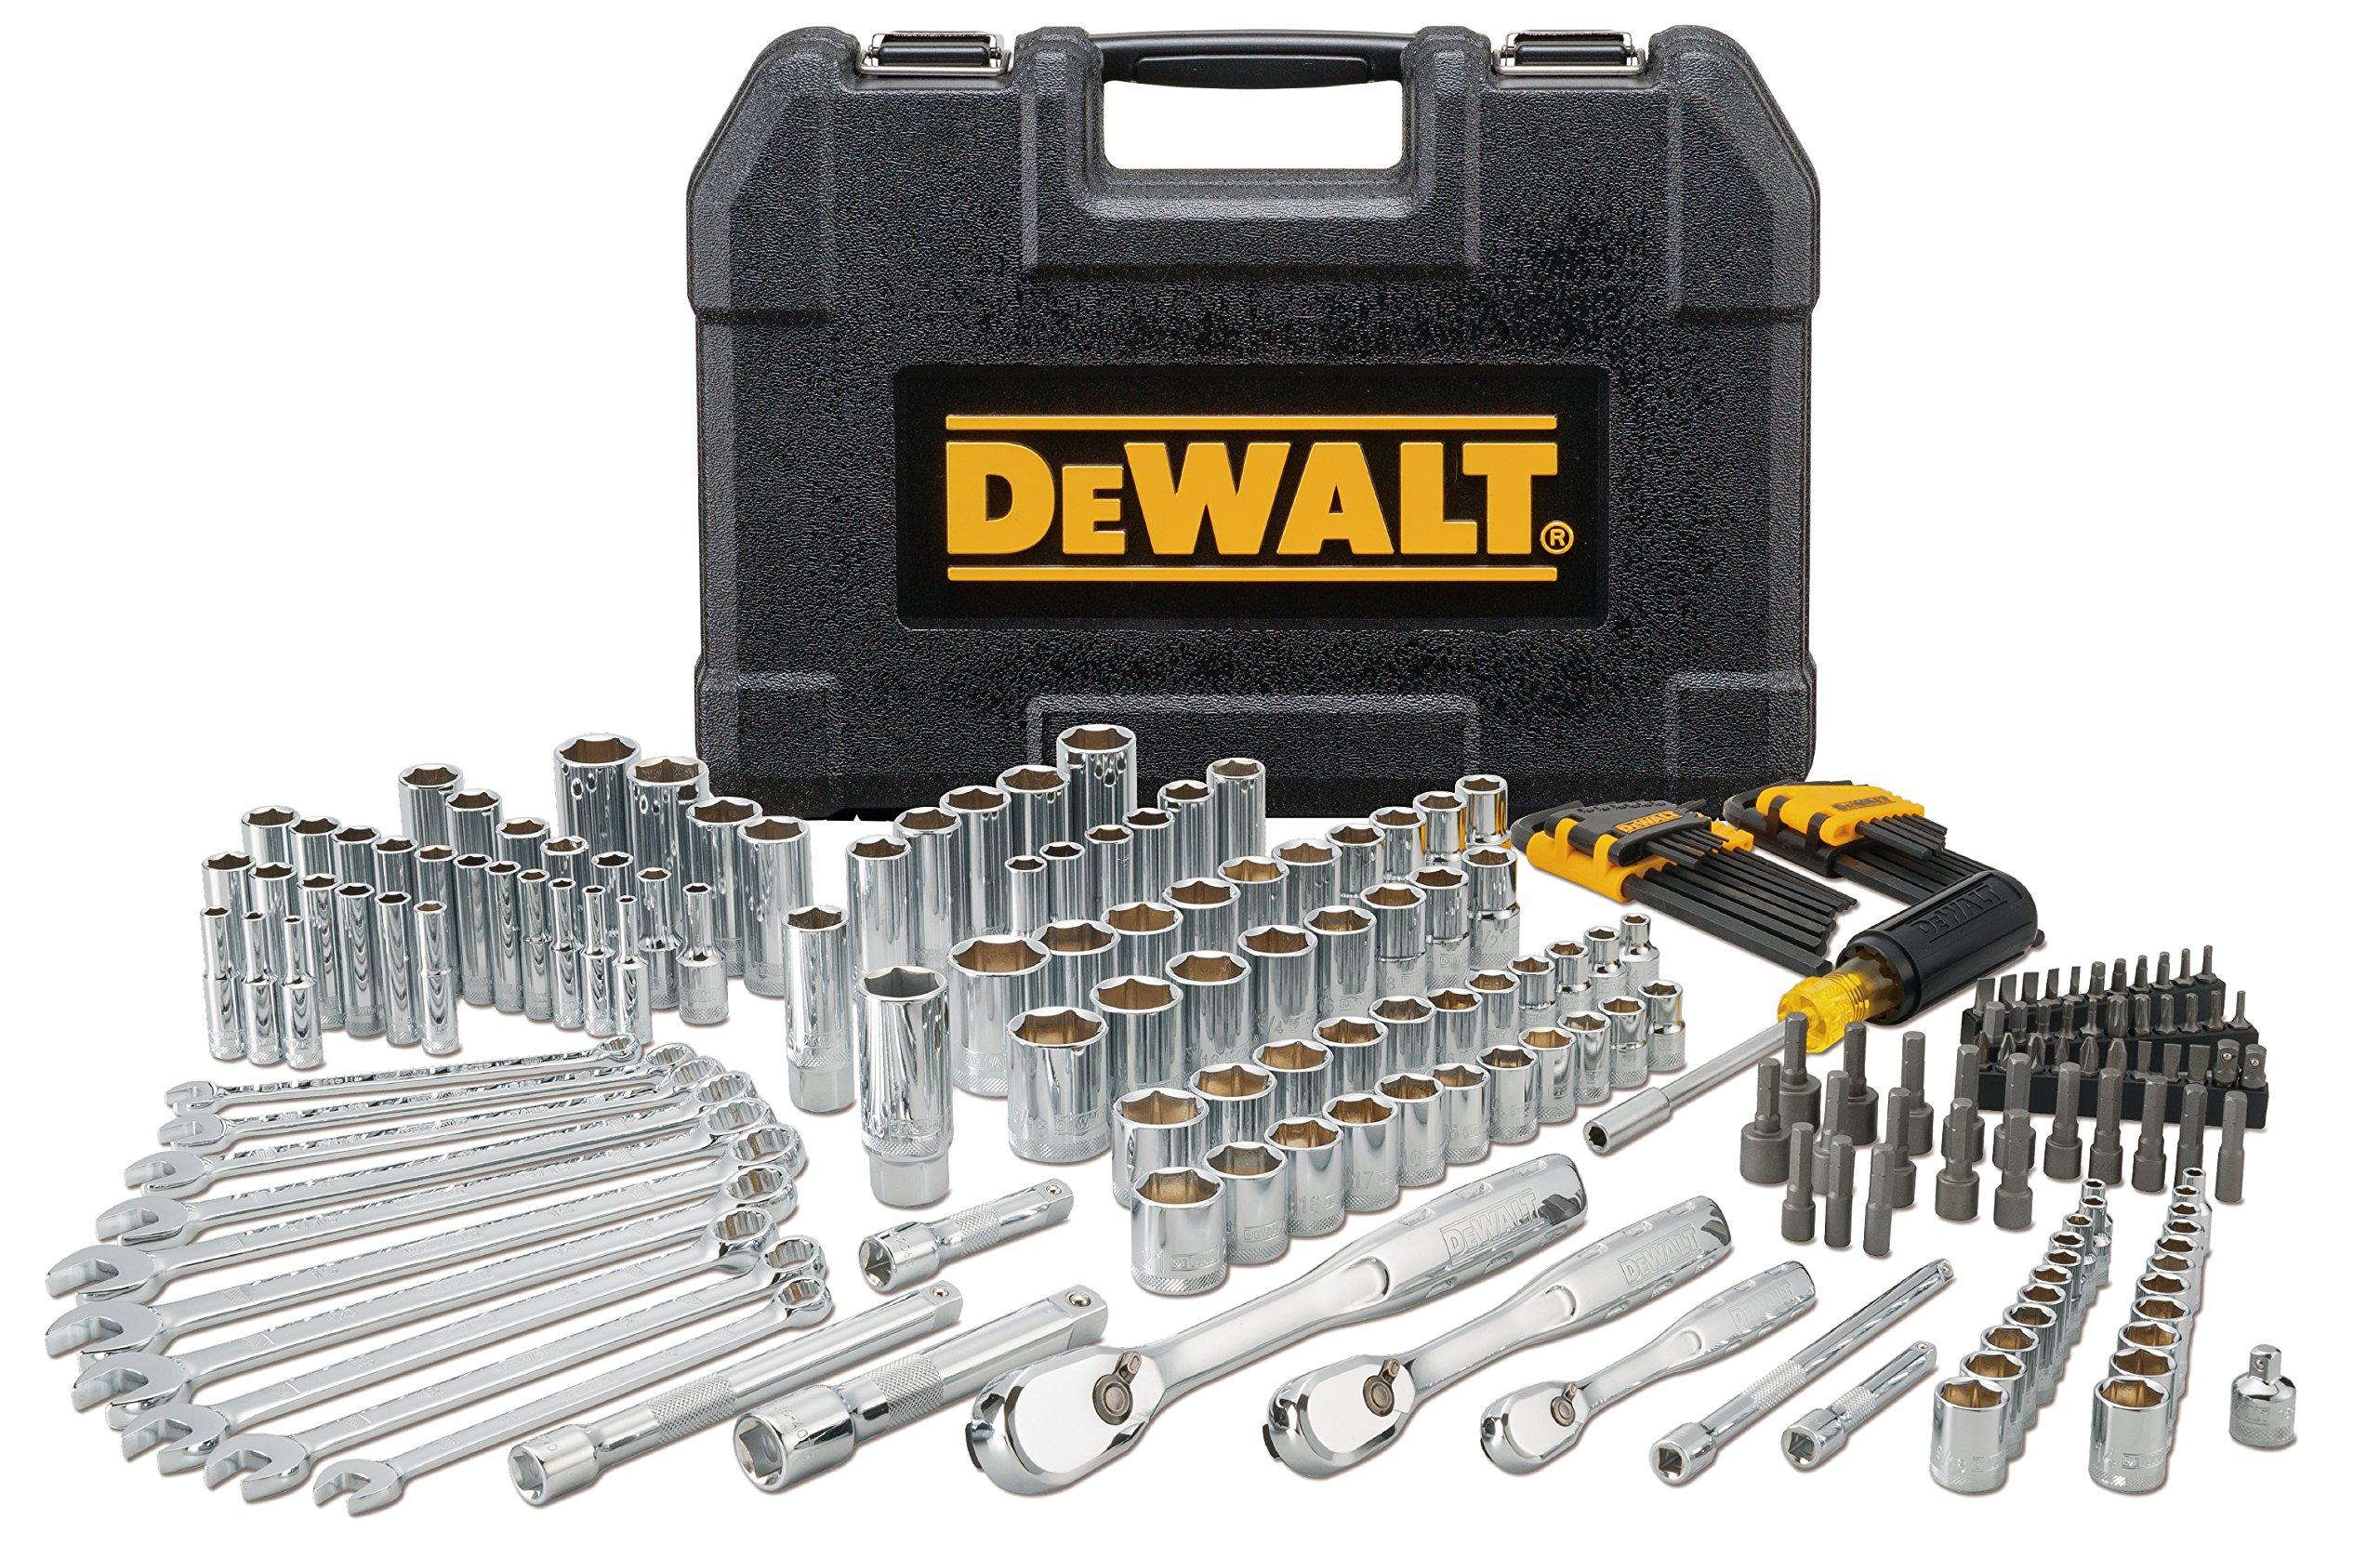 DEWALT Mechanics Tool Set, 205-Piece (DWMT81534) by DEWALT